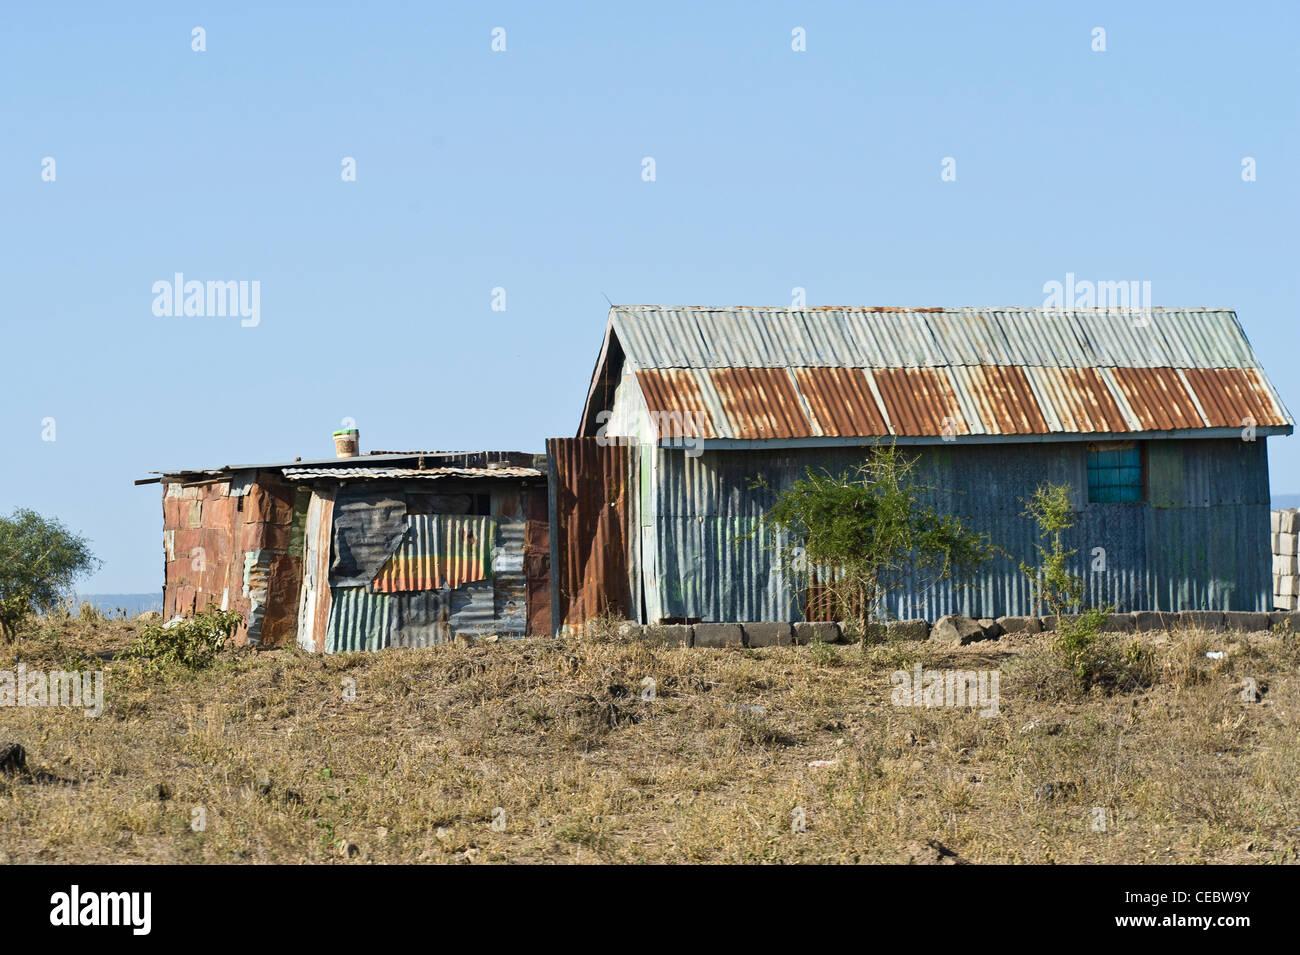 House built with corrugated sheet iron Arusha Tanzania - Stock Image